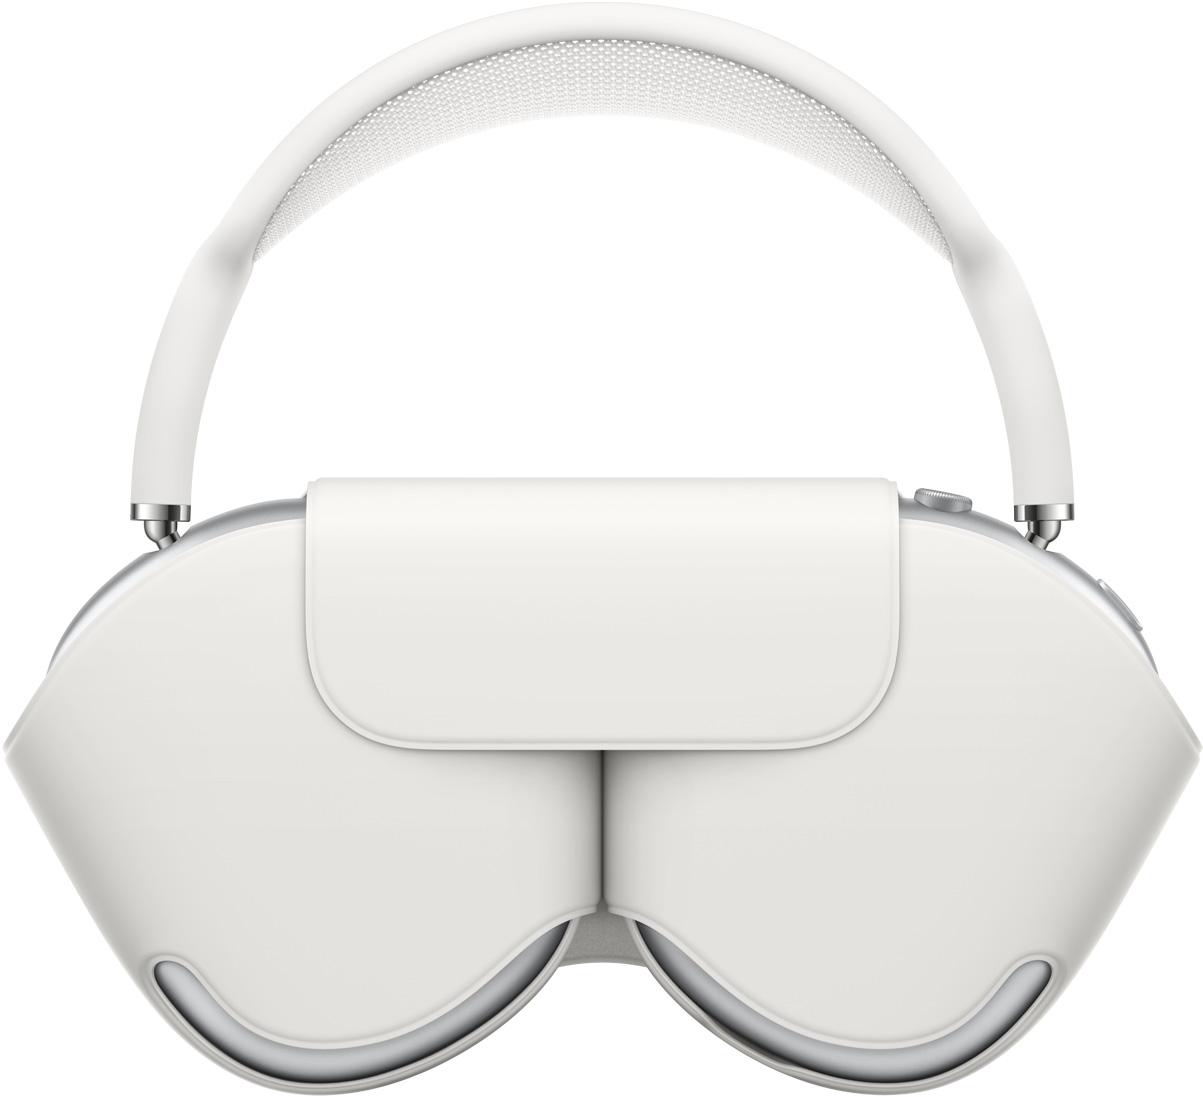 AirPods Maxの専用ケース